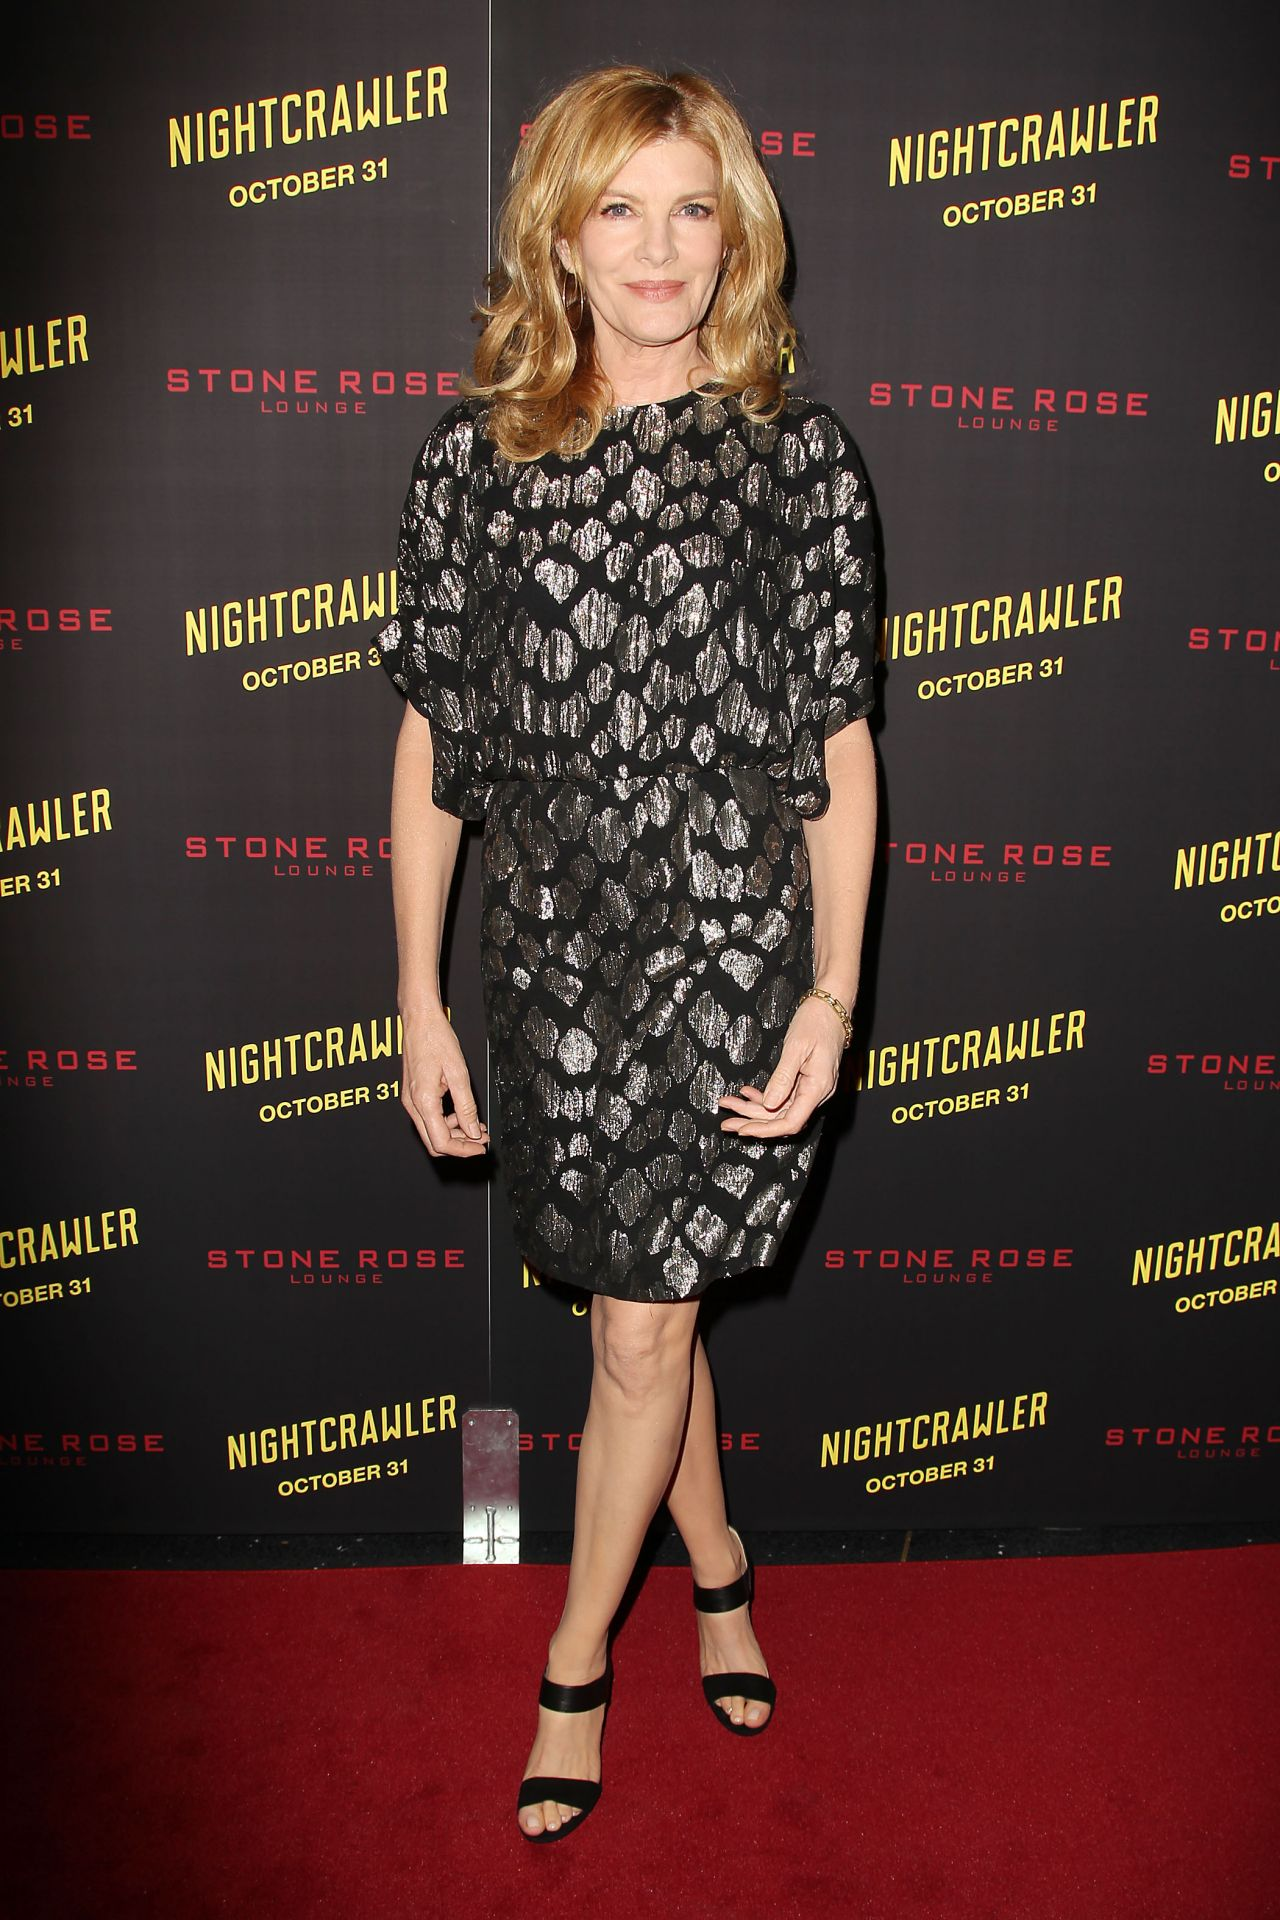 Rene Russo Nightcrawler Premiere In New York City